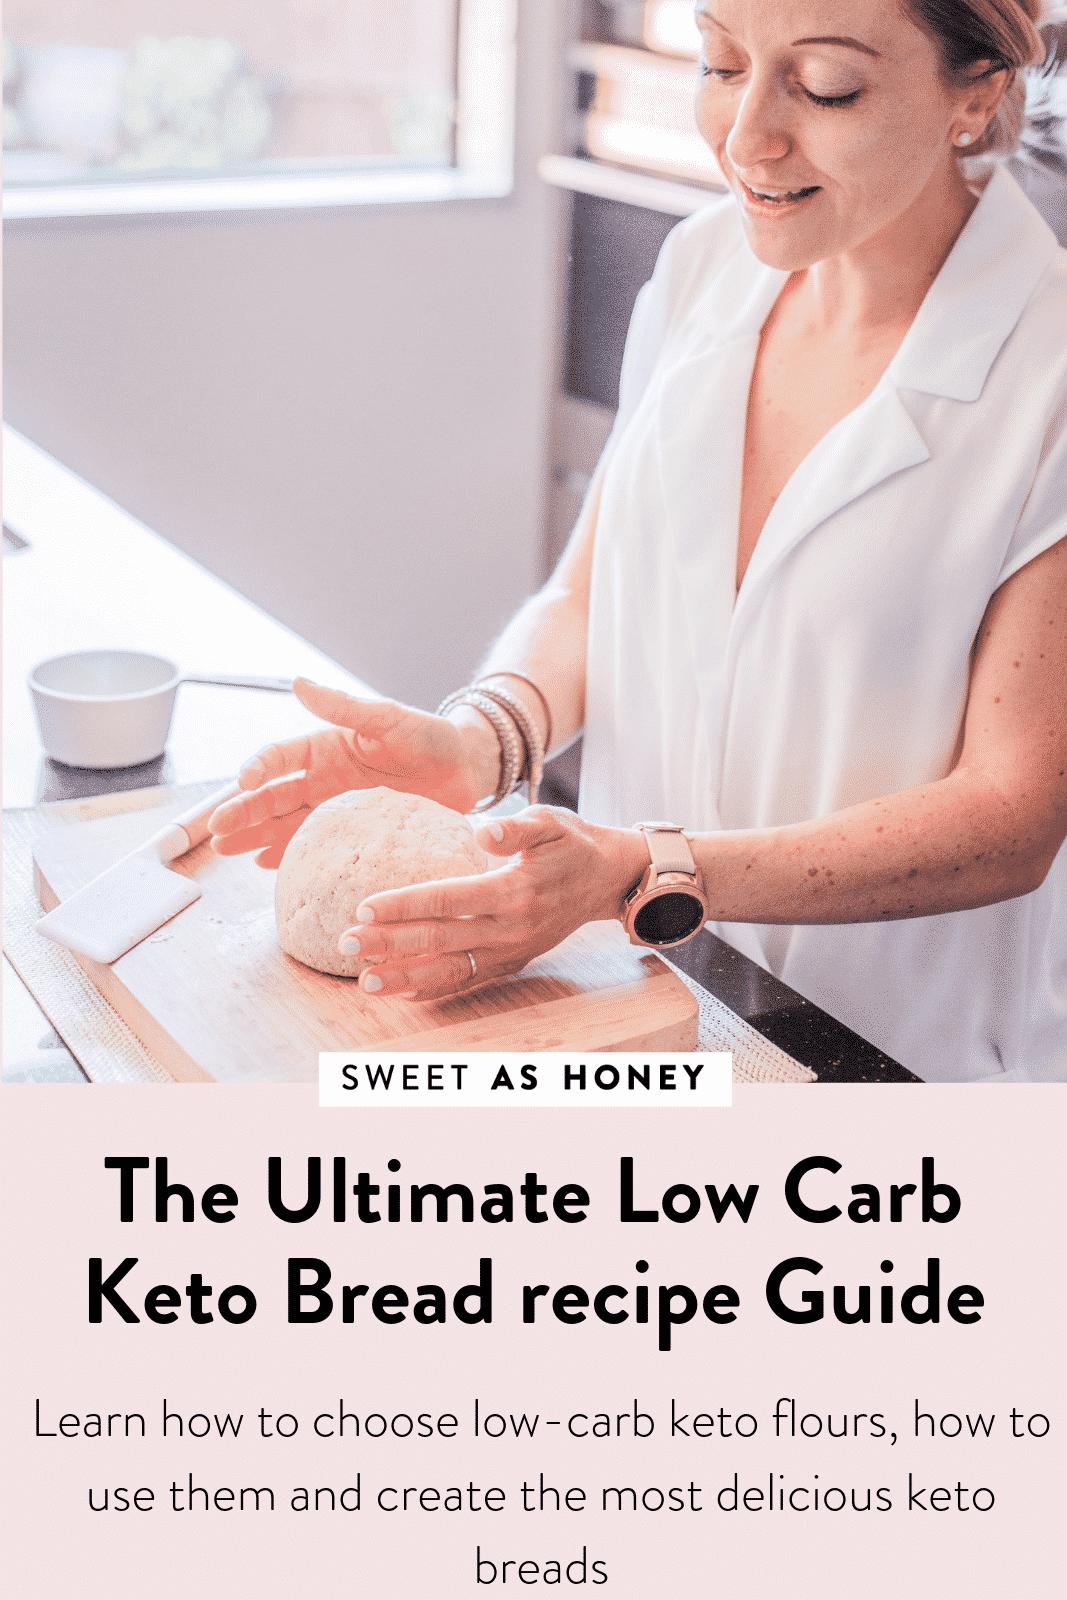 The ultimate low carb keto bread recipe guide